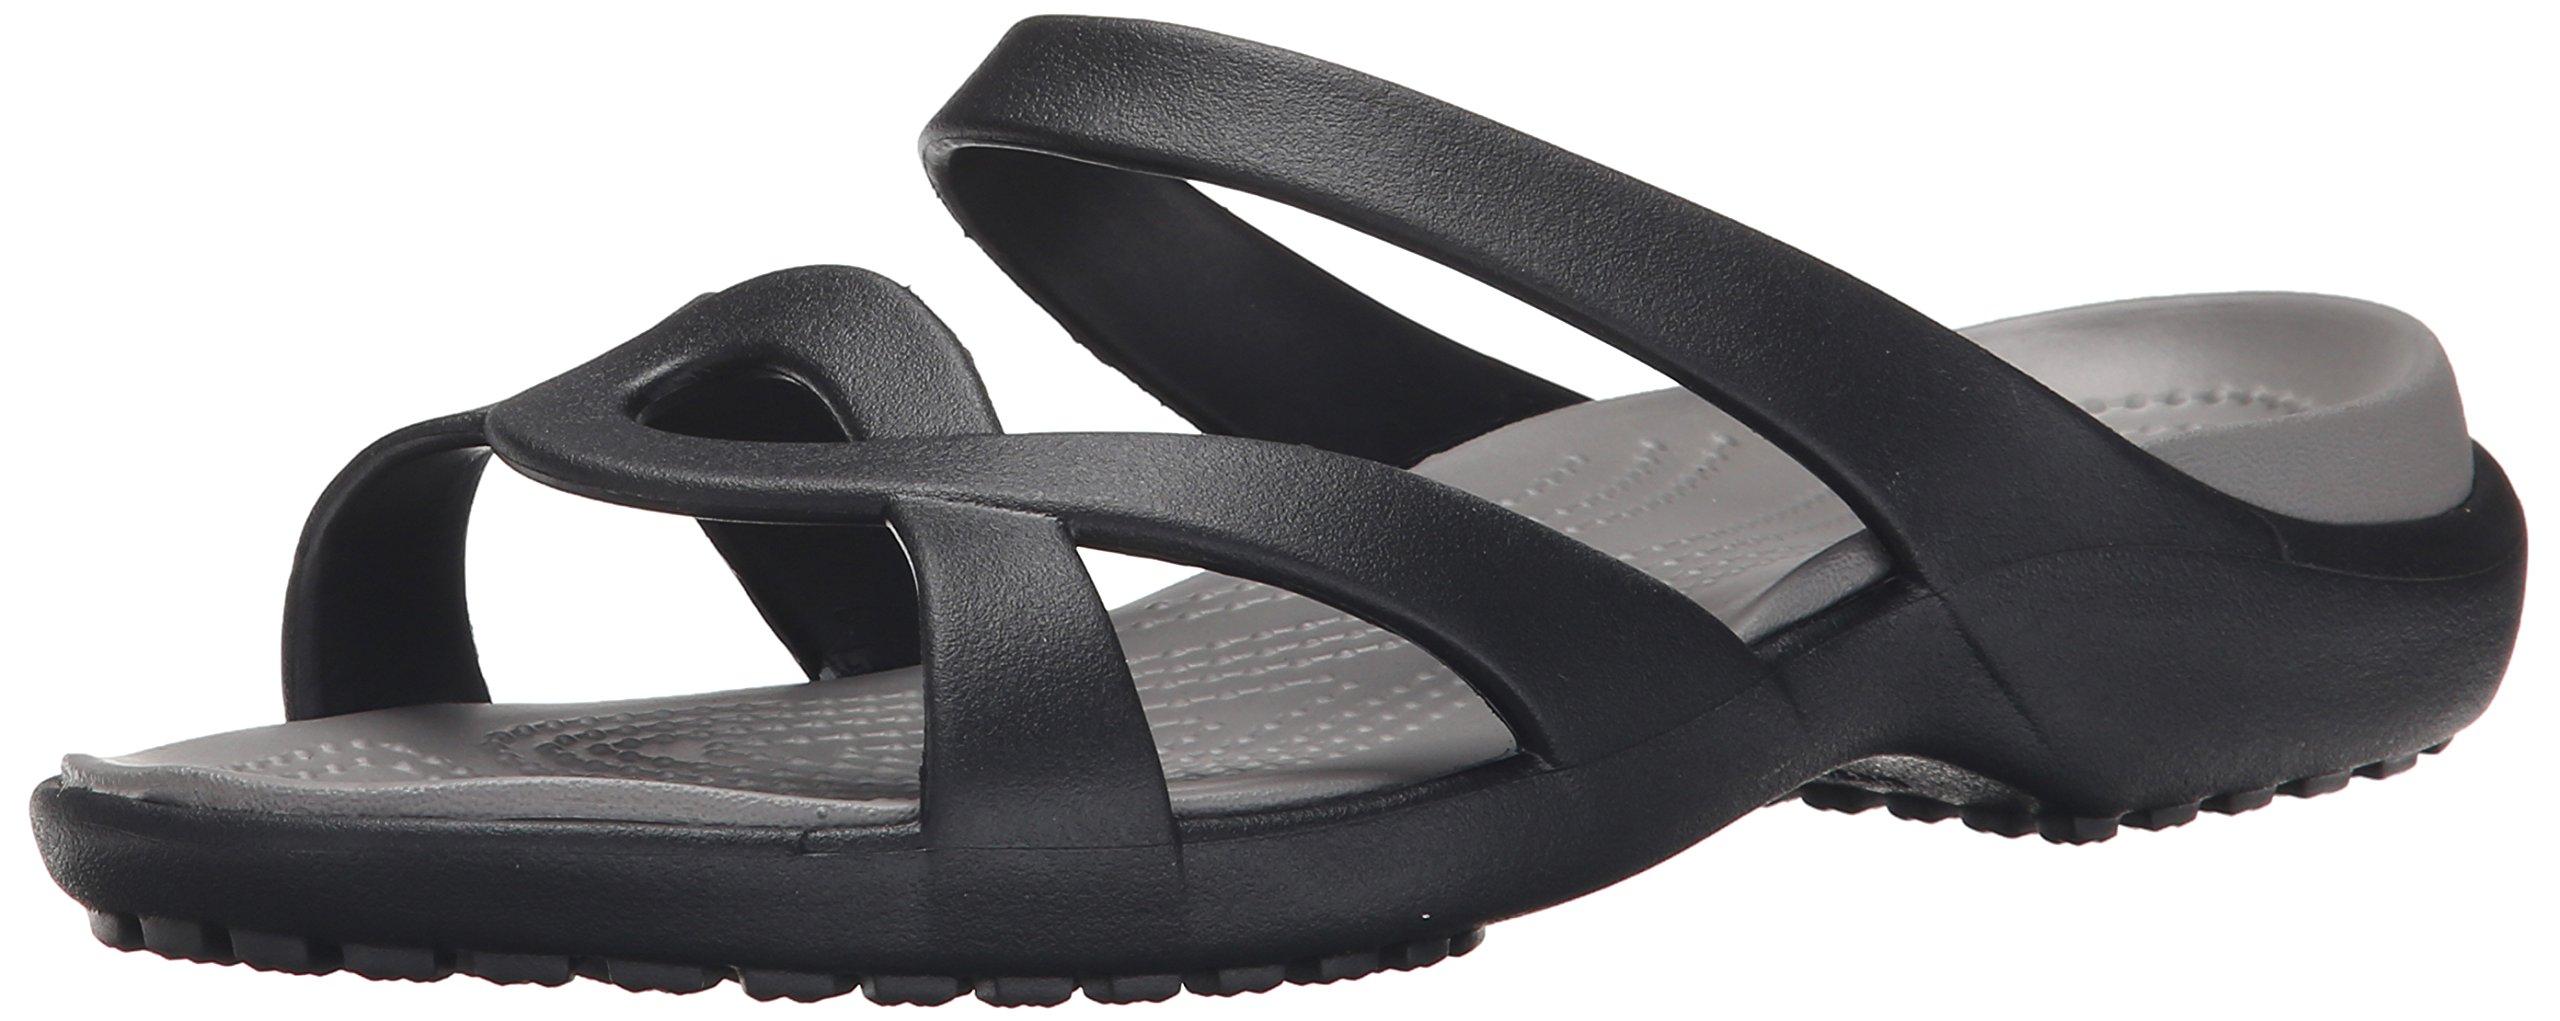 crocs Women's Meleen Twist Sandal, Black/Smoke, 9 US/9 M US by Crocs